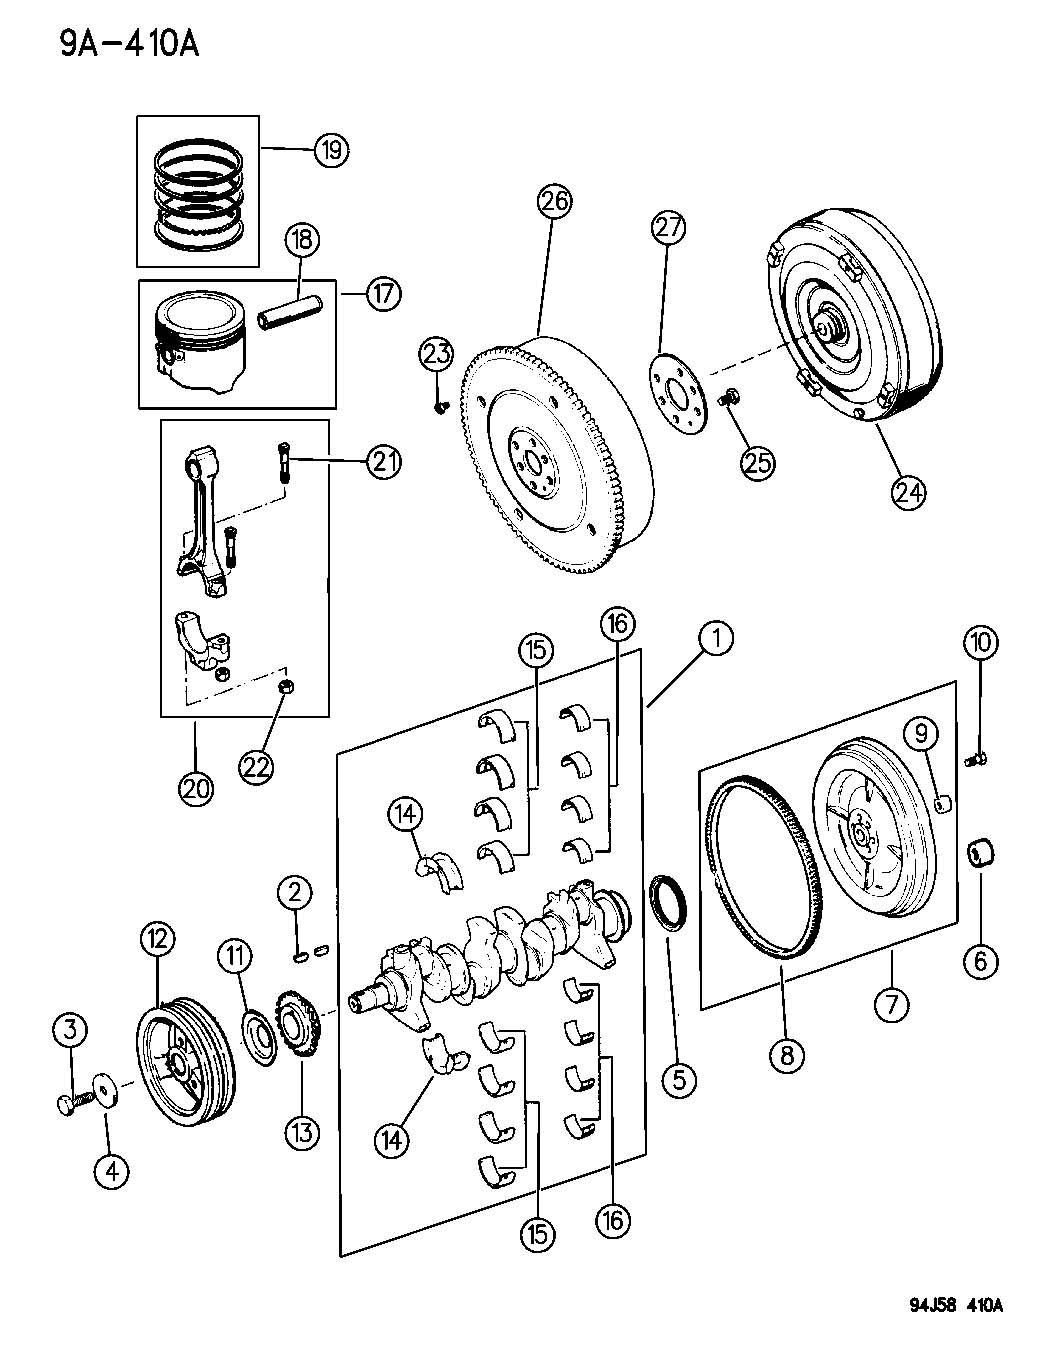 Service Manual Removing Torque Convertor Jeep